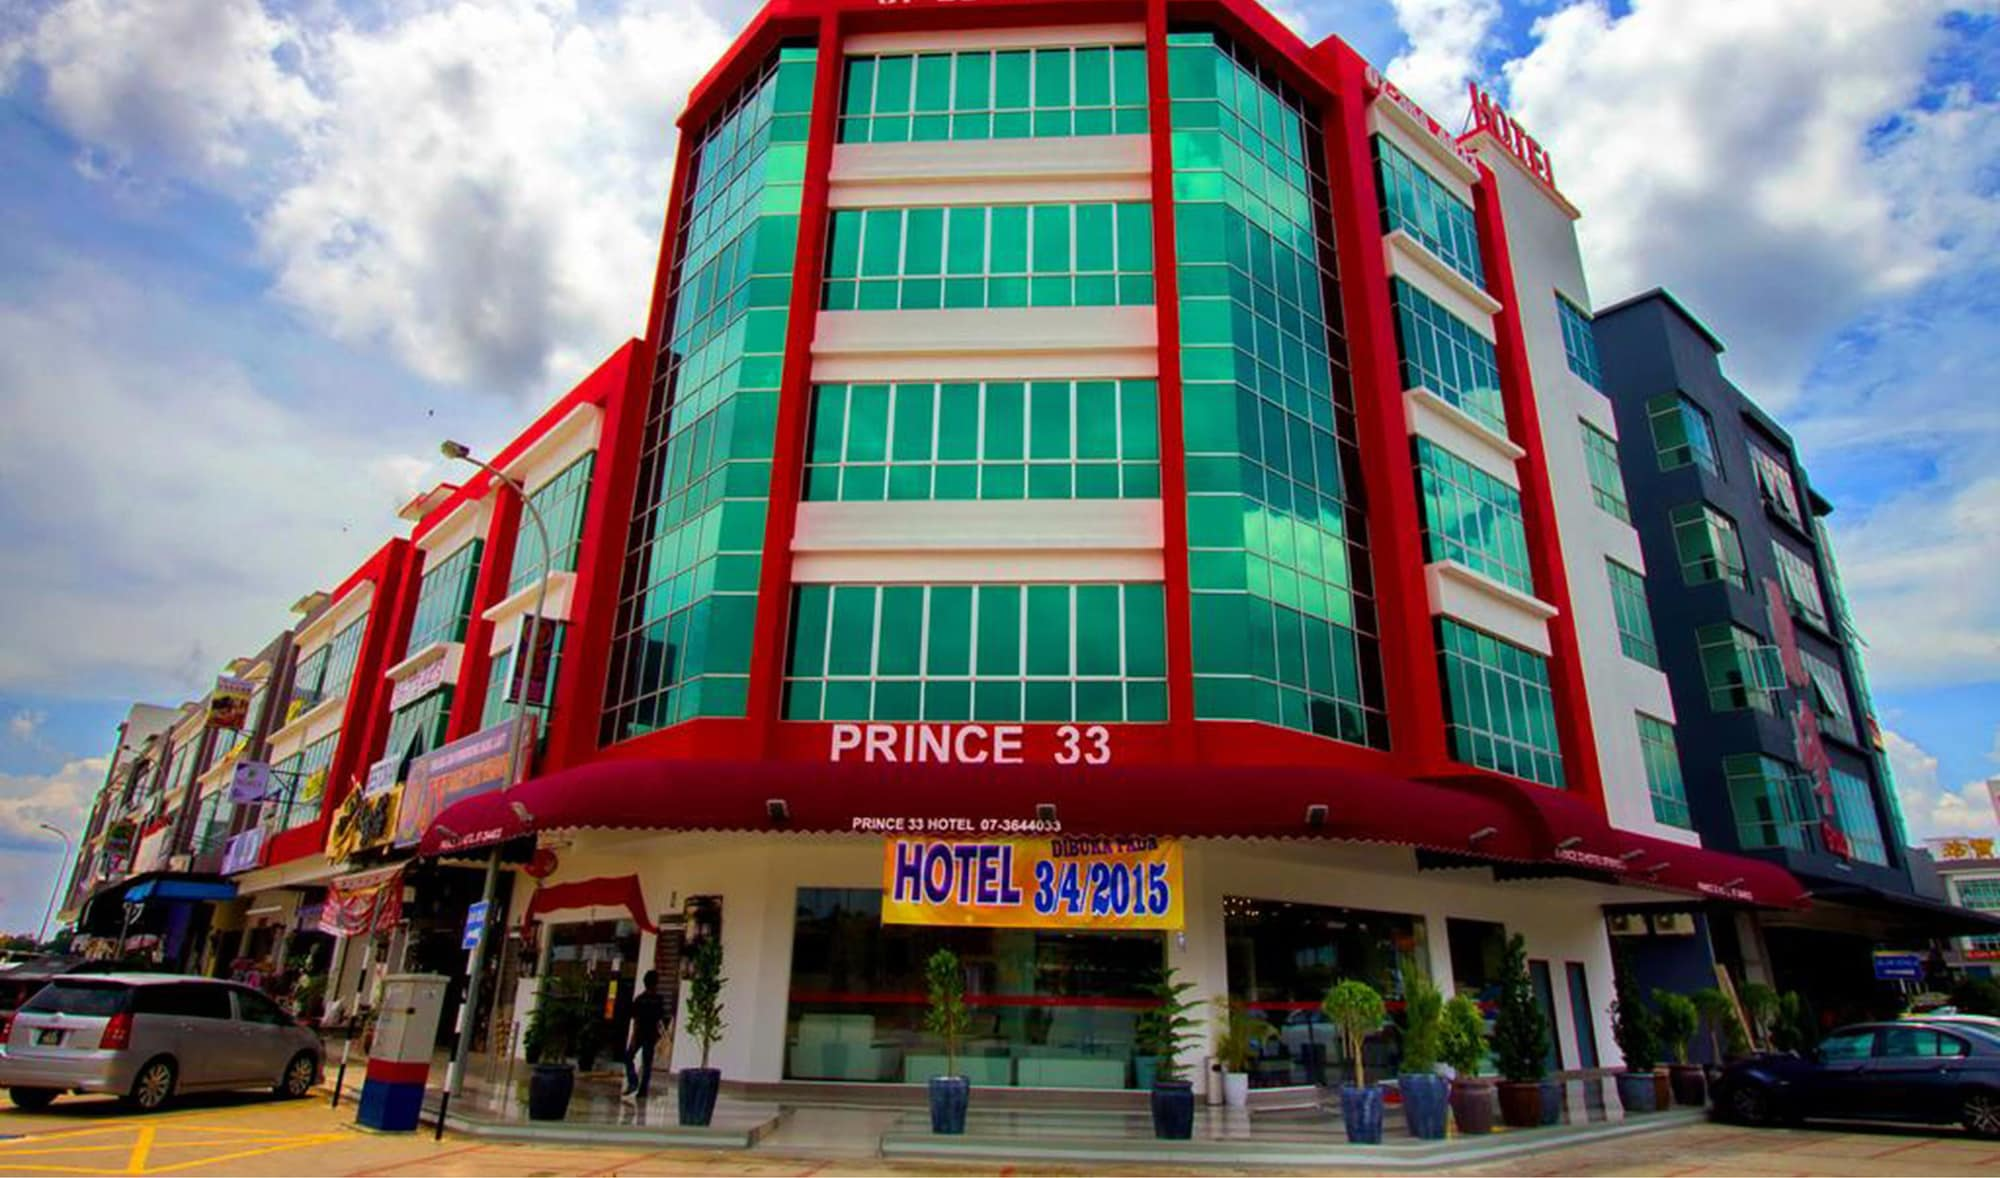 Prince 33 Hotel, Johor Bahru